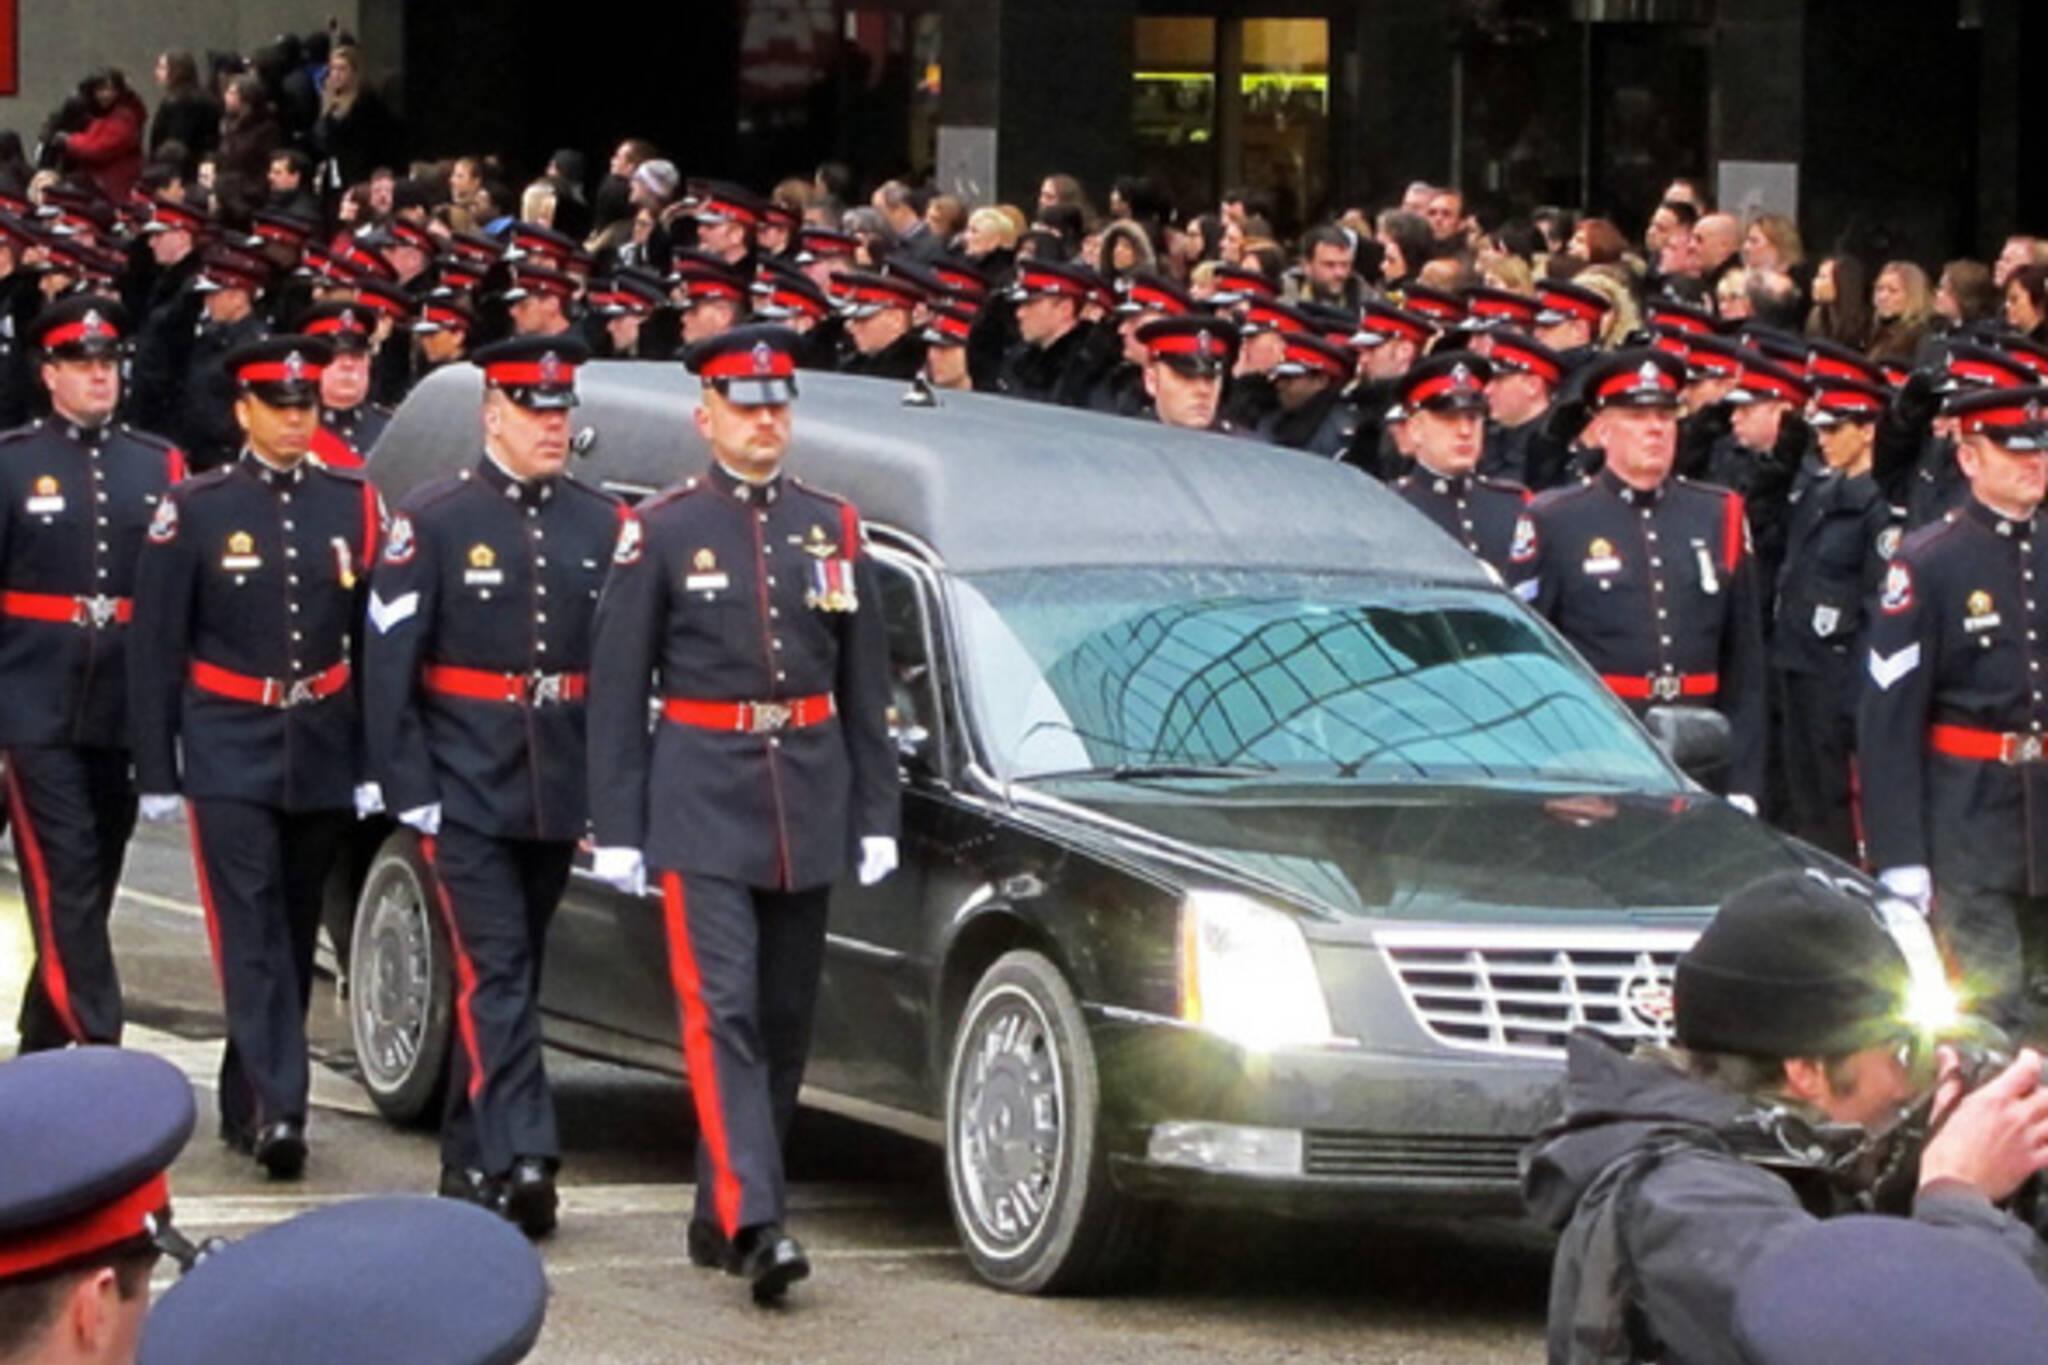 Ryan Russel Funeral Toronto